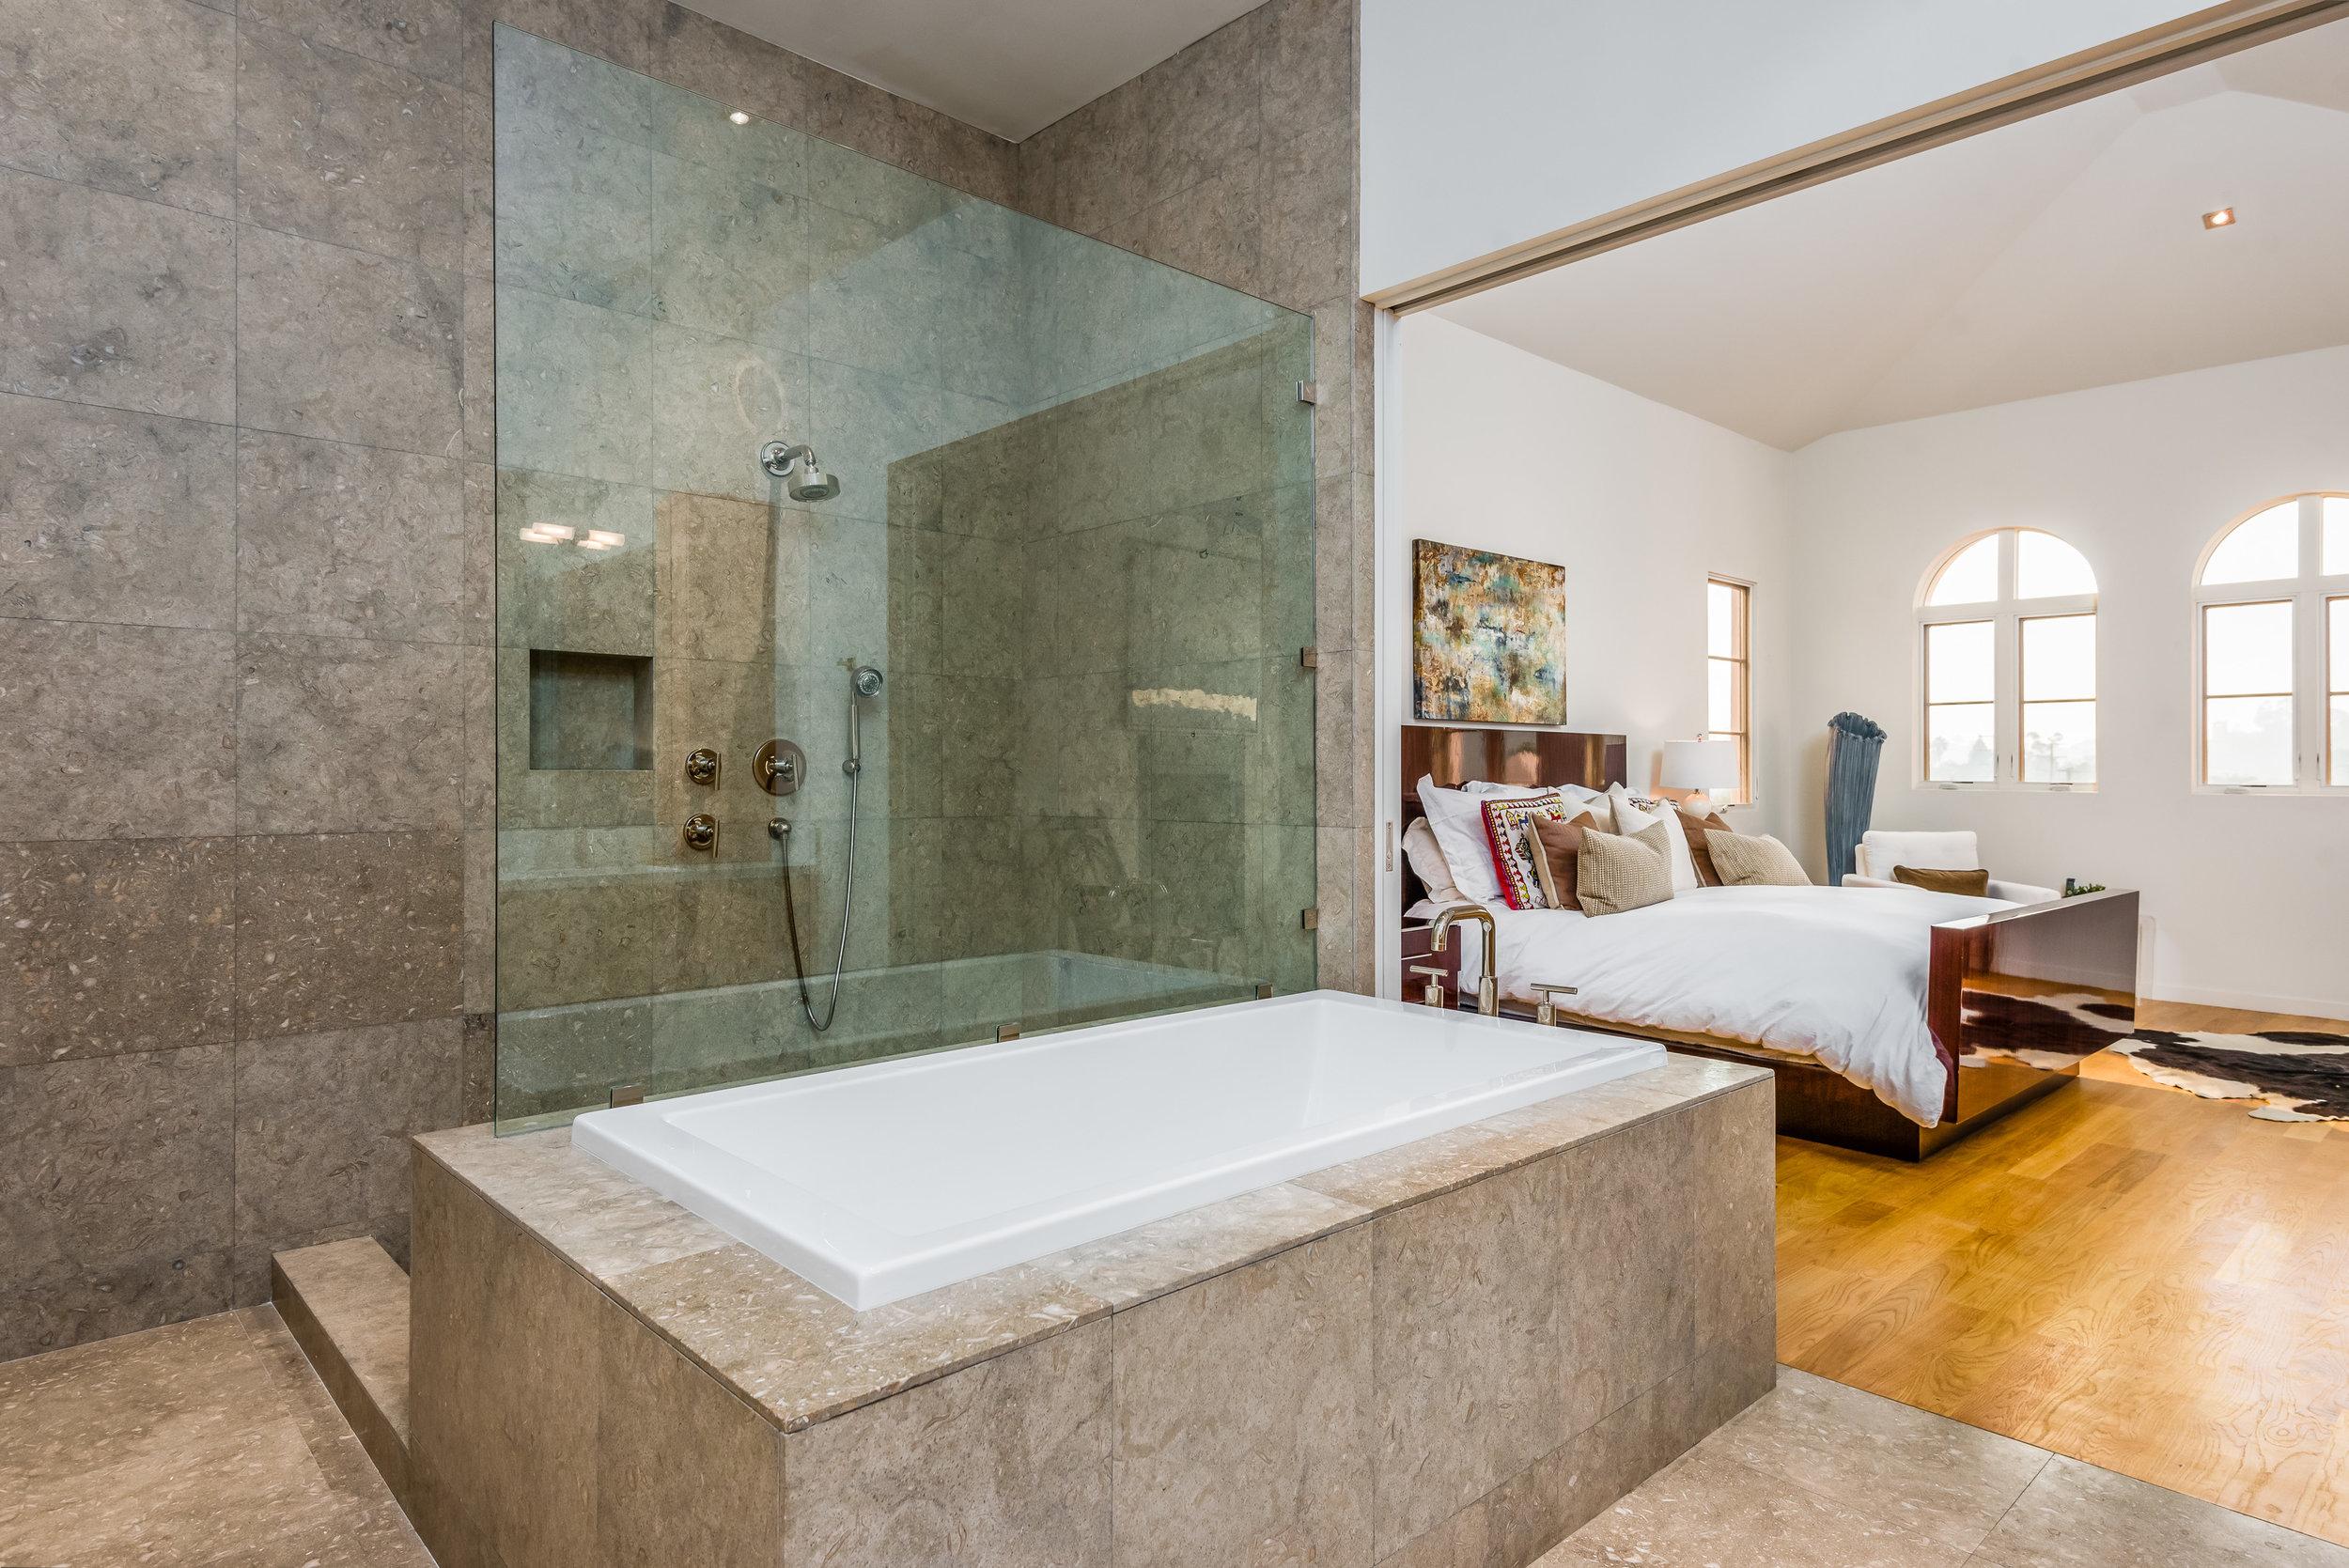 011_11-Master Bathroom.jpg